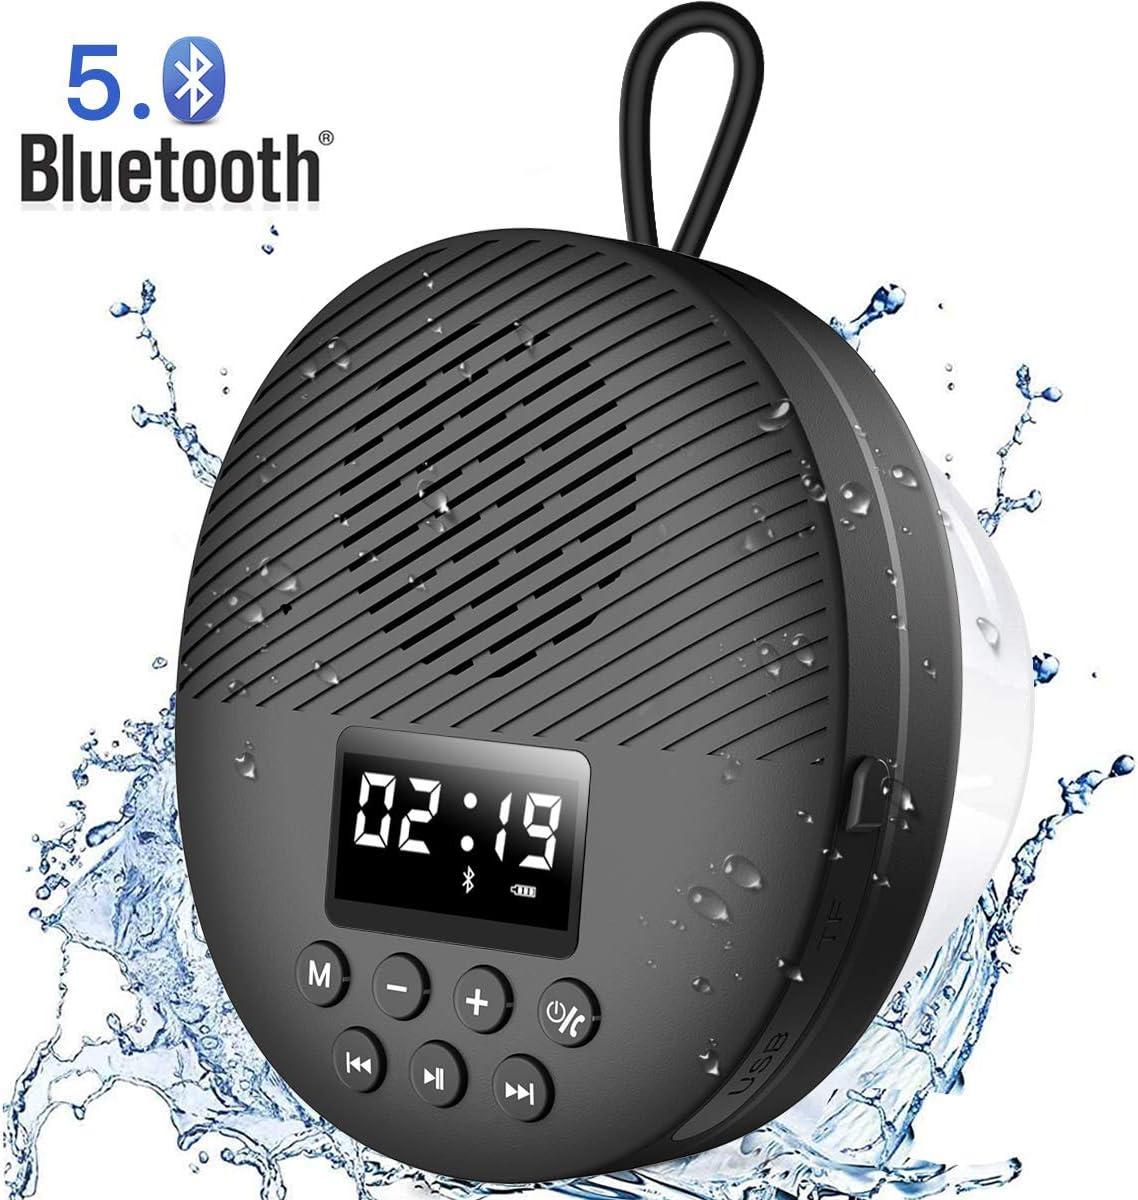 AGPTEK Altavoz de Ducha Impermeable Bluetooth Altavoz Portátil Radio de Ducha Bluetooth 5.0 Pantalla LED TF Tarjeta de Apoyo Micrófono Integrado para Baño Ducha Playa